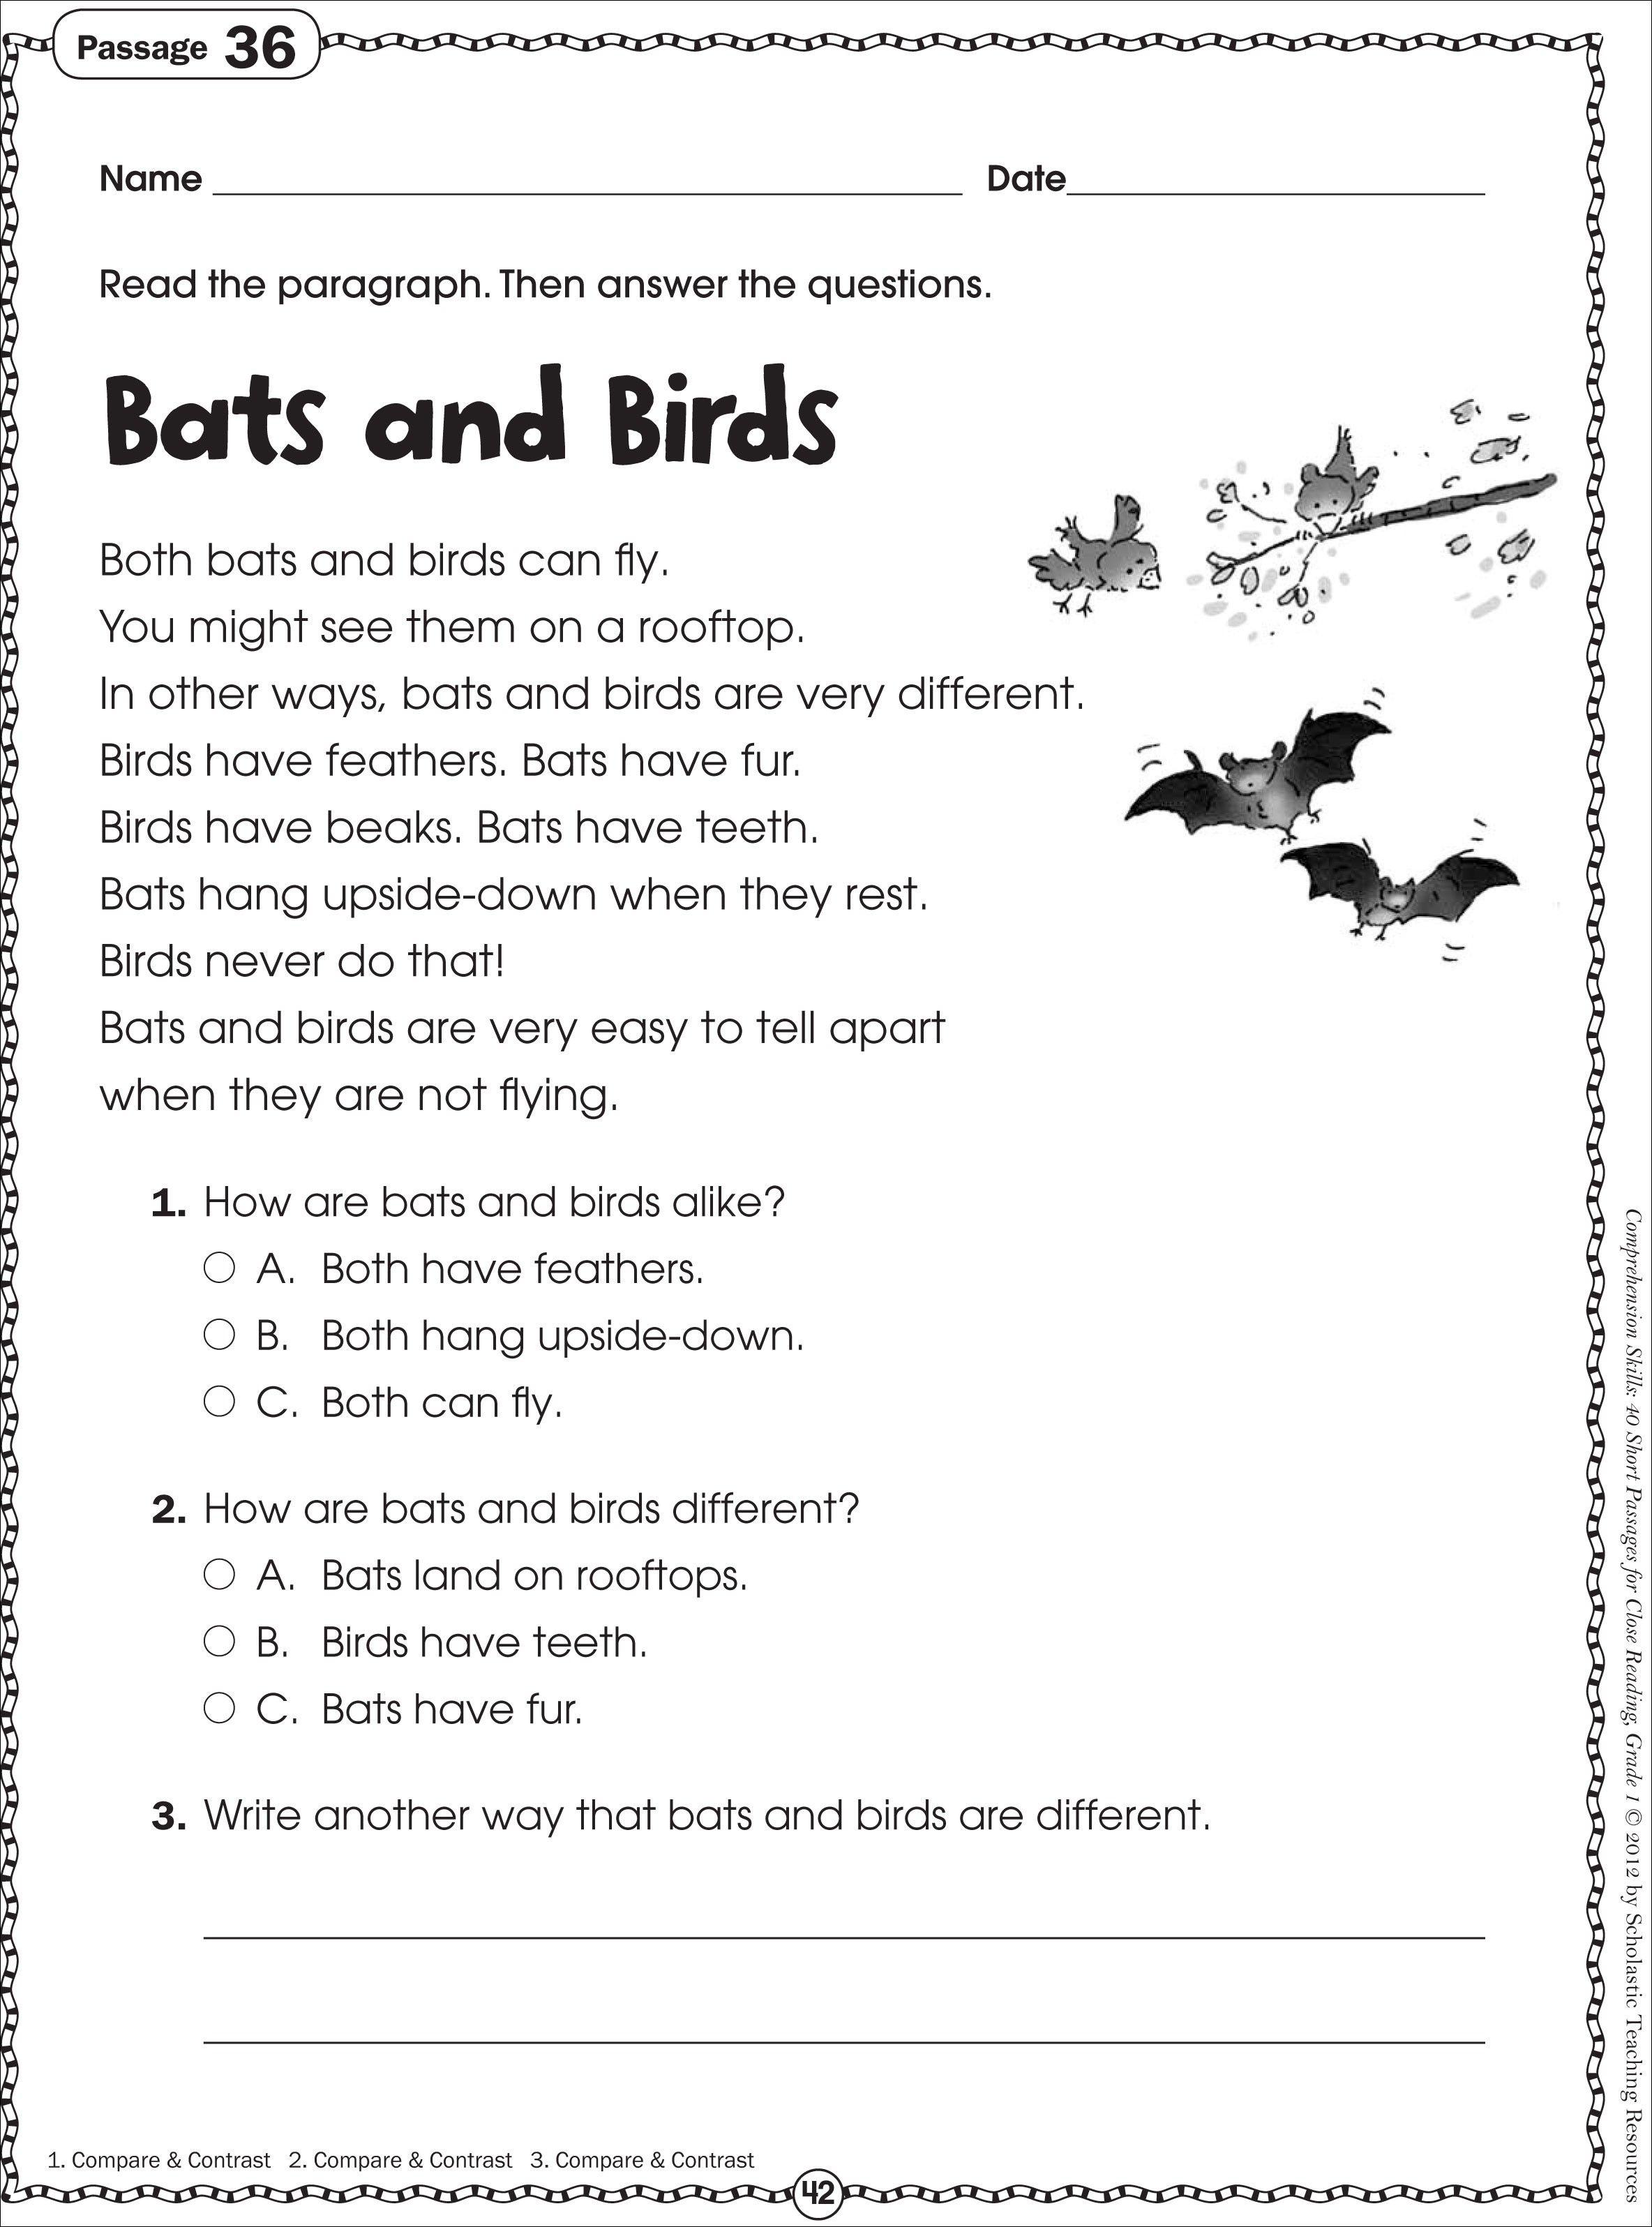 Free Printable Reading Comprehension Worksheets For Kindergarten - Free Printable Short Stories For 2Nd Graders